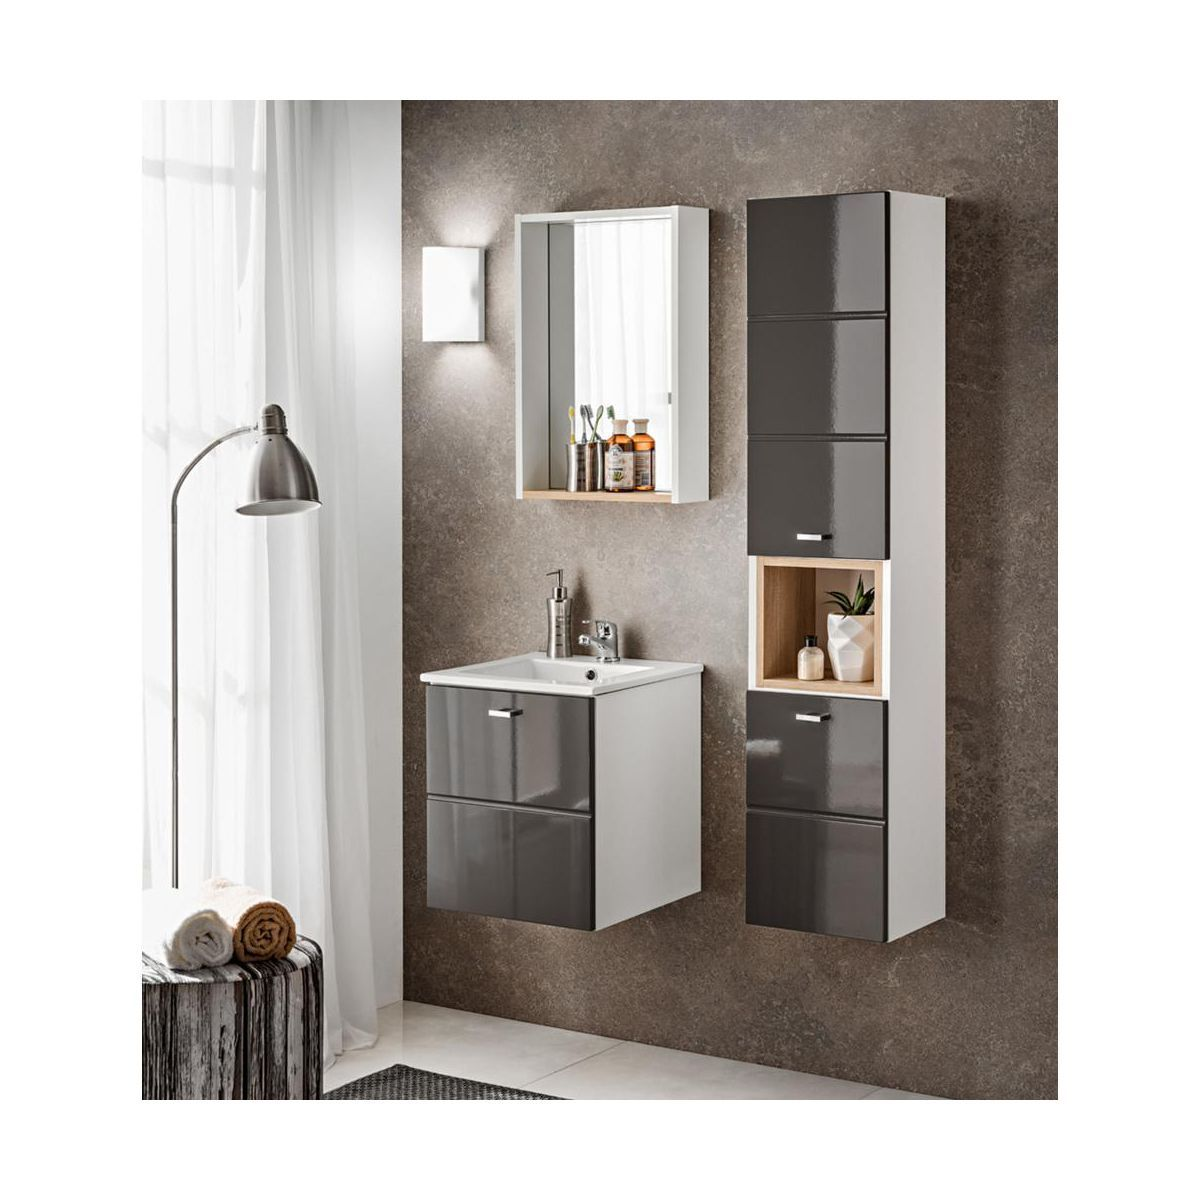 Umywalka Cfp 40d Comad Umywalki W Atrakcyjnej Cenie W Sklepach Leroy Merlin Diy Bathroom Vanity Diy Bathroom Bathroom Sets